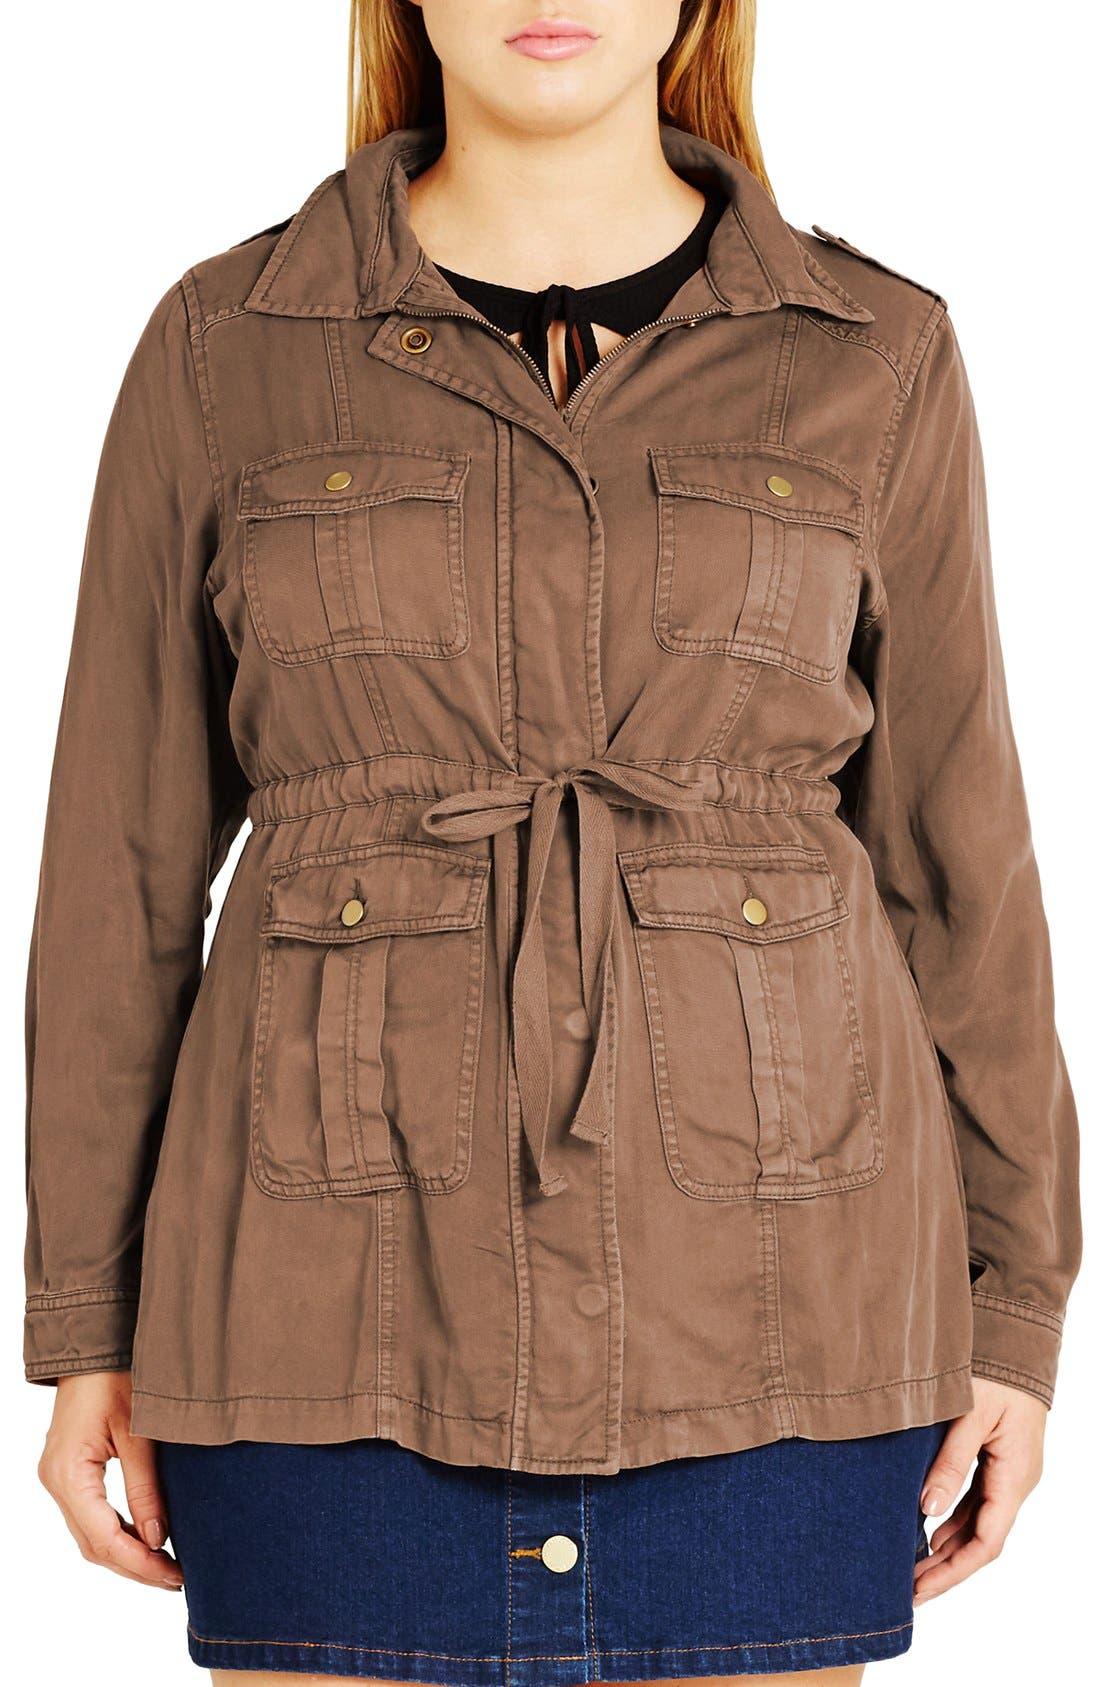 Alternate Image 1 Selected - City Chic 'Adventure' Utility Jacket (Plus Size)